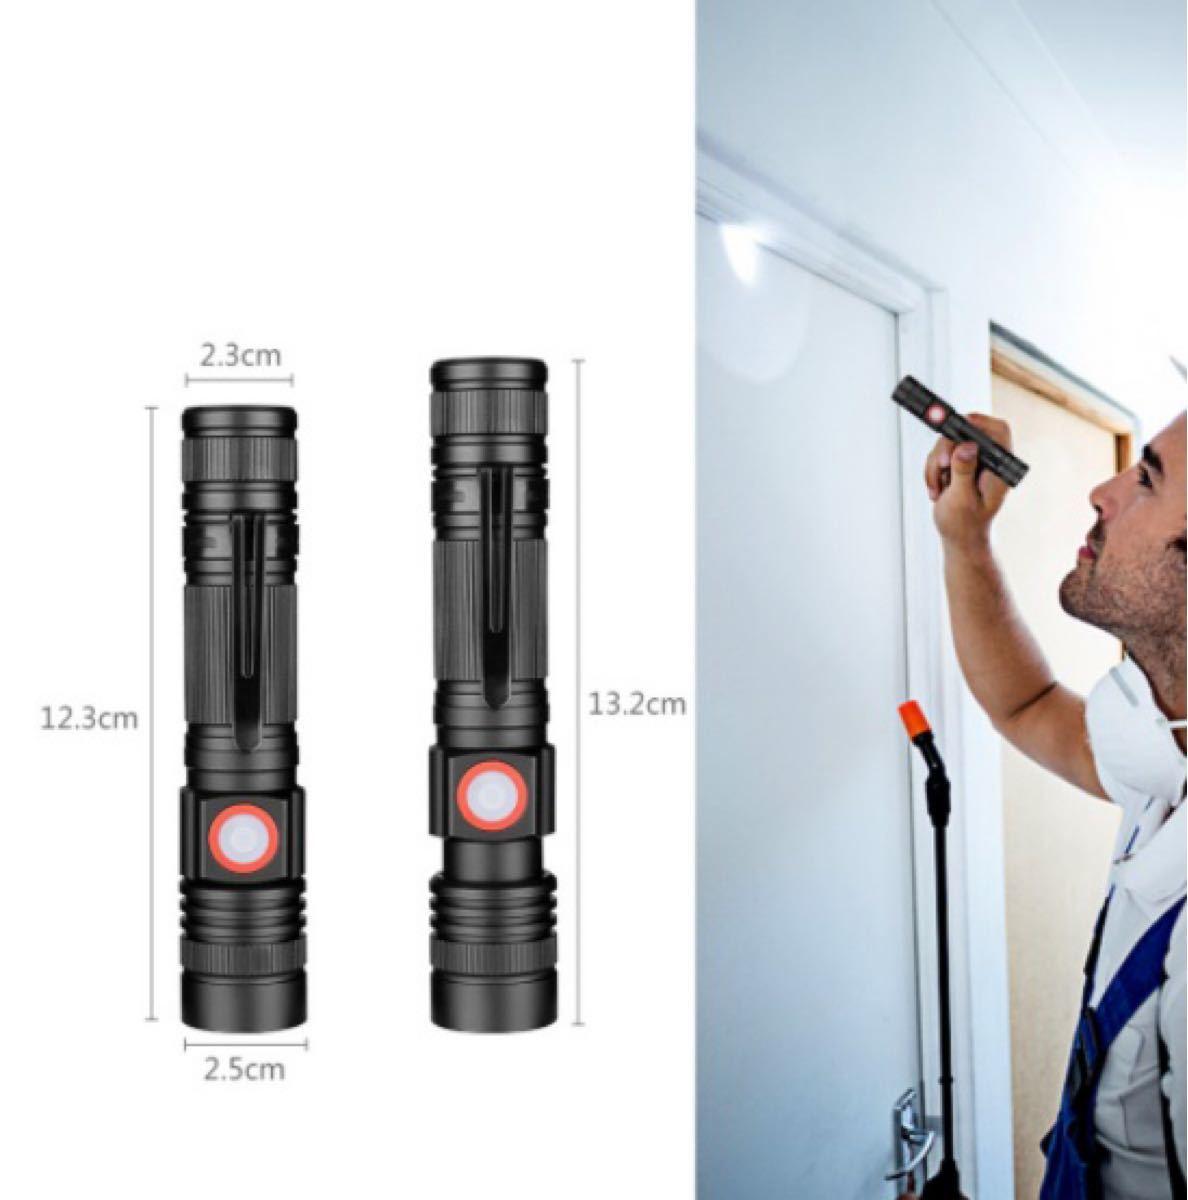 USBケーブル付き懐中電灯 led USB充電式 強力XML-T6 防水